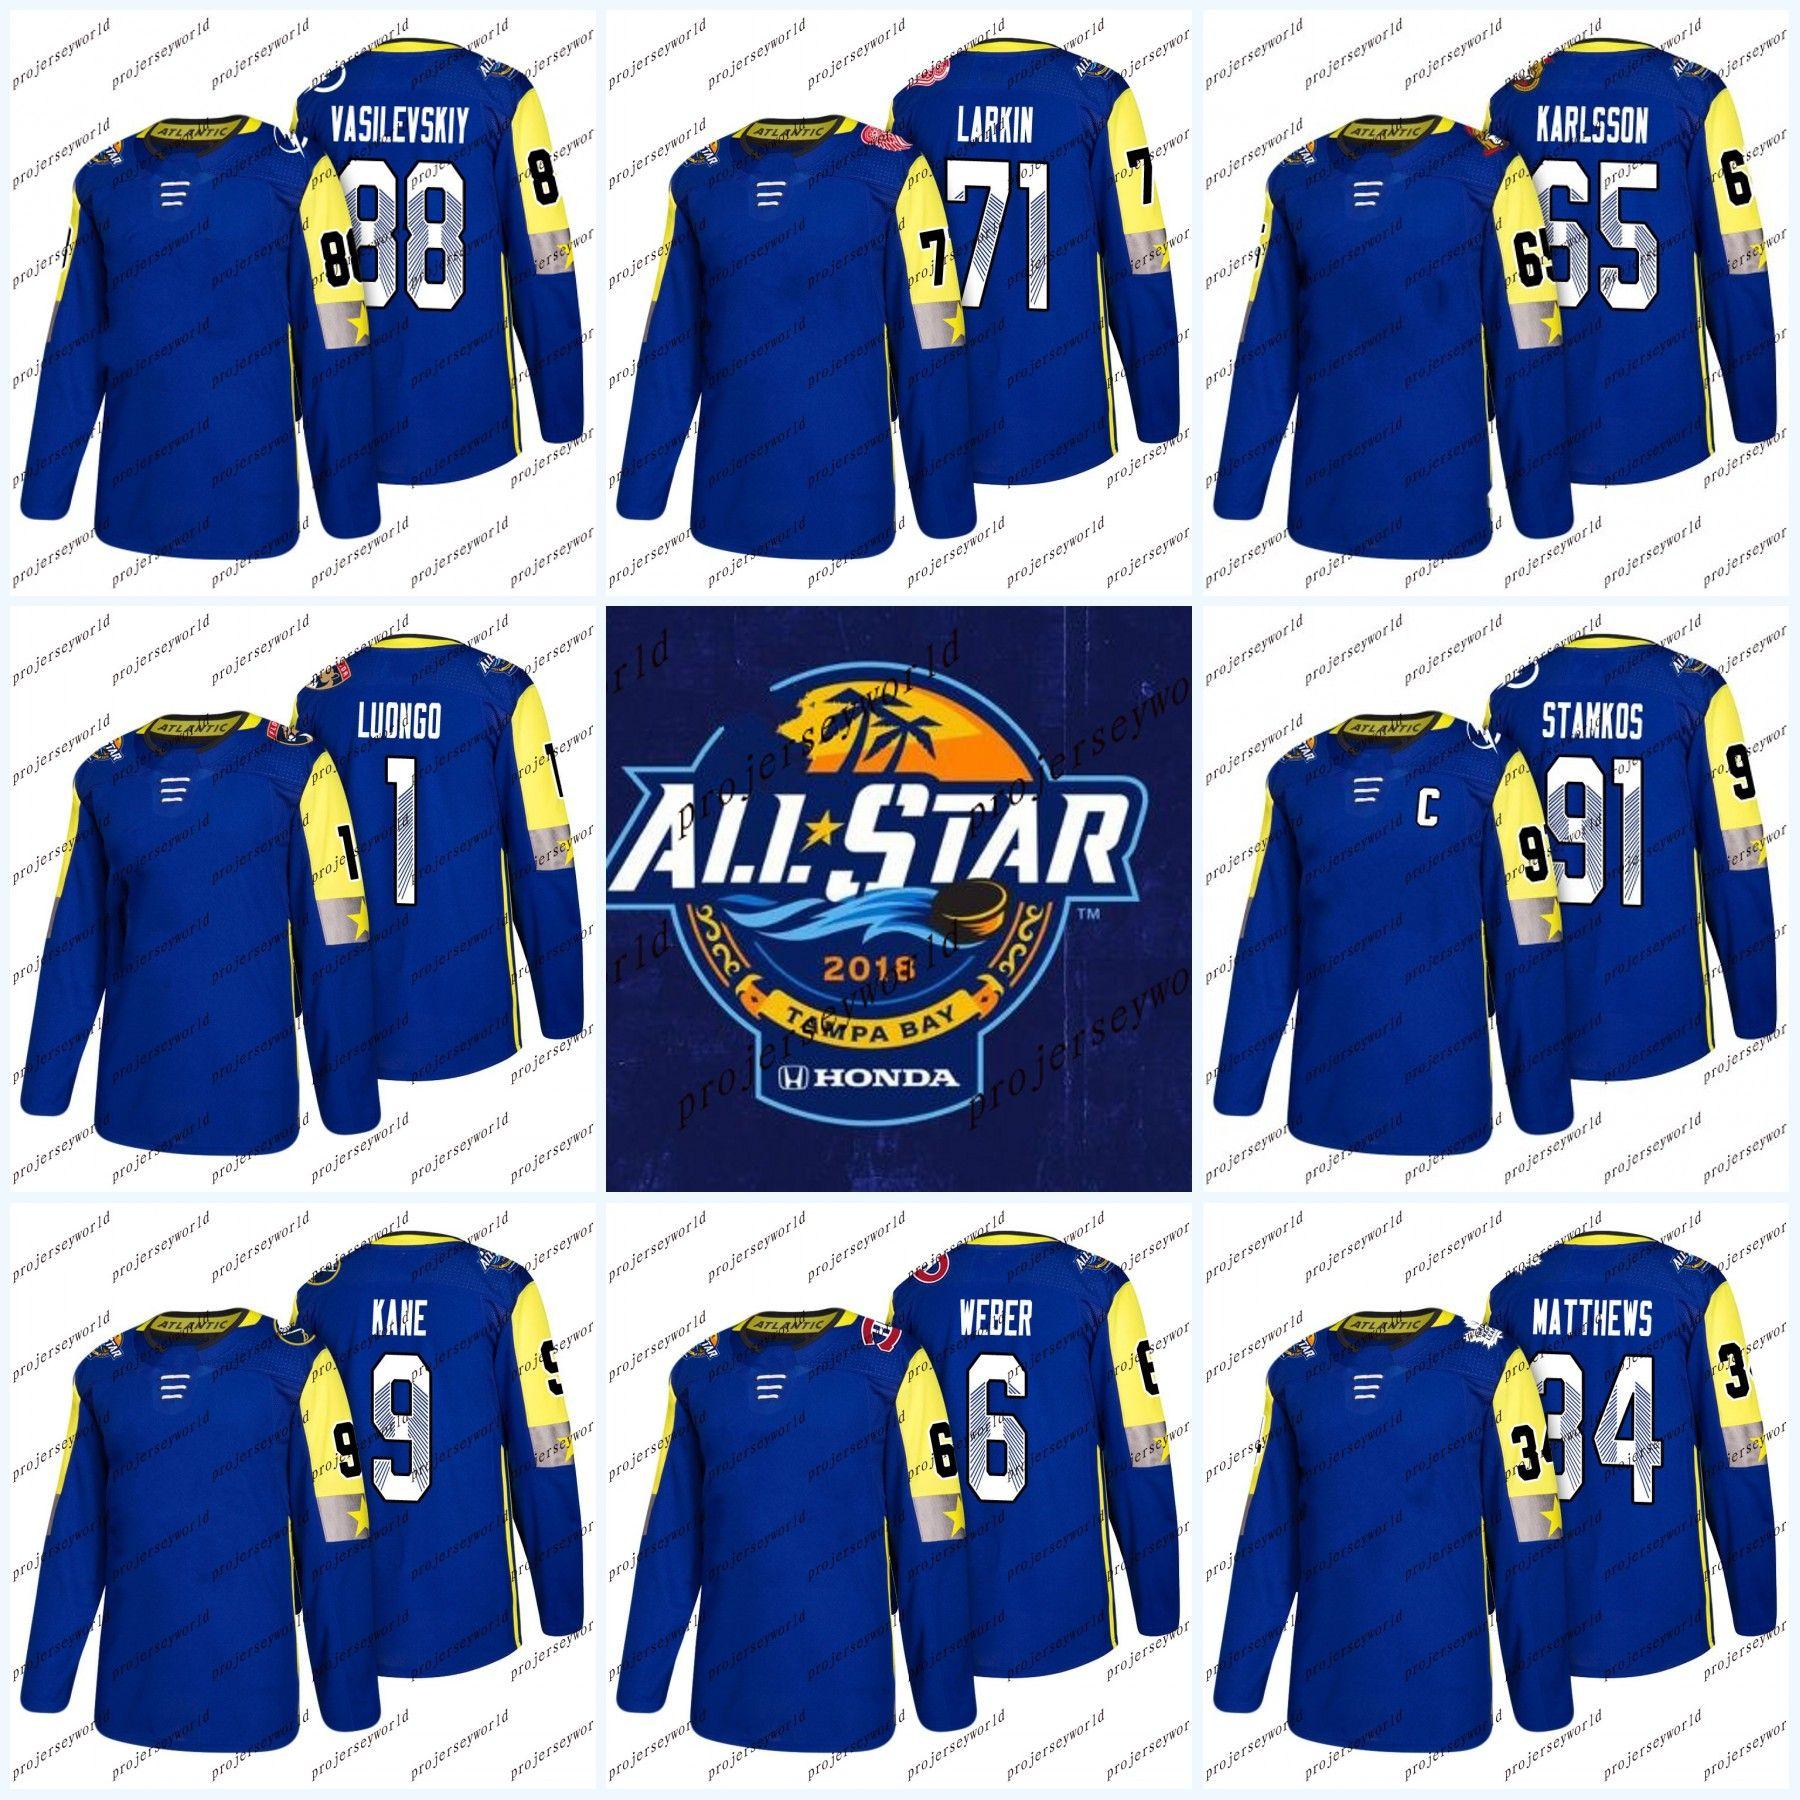 new style 8086b 3e164 Star Matthews Jersey 2019 All Auston lockup.paganellisport.com